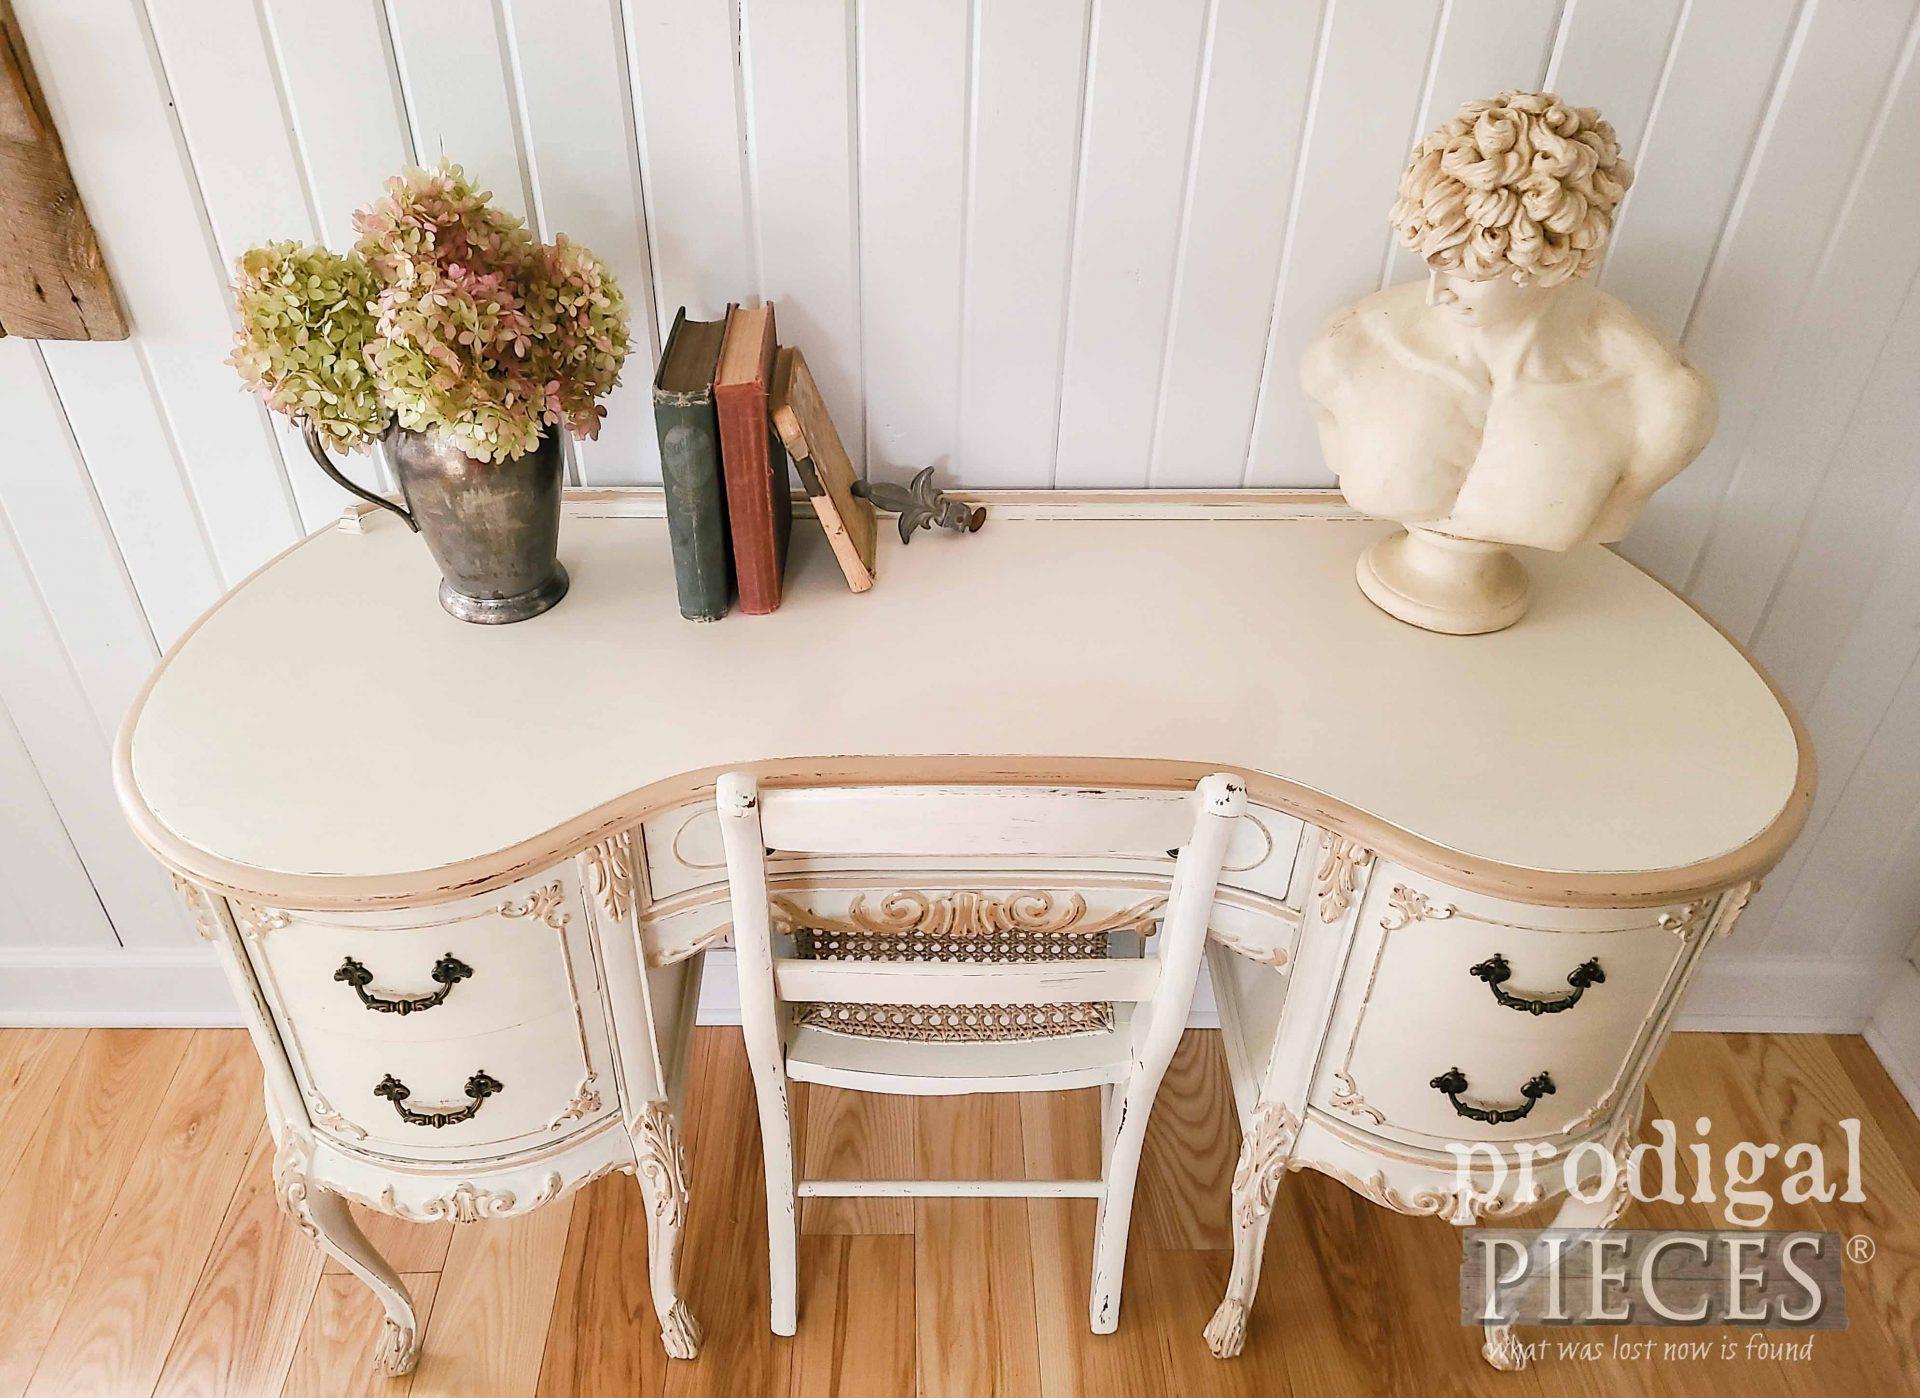 Gorgeous Antique White Kidney Desk Top Refinished by Larissa of Prodigal Pieces | prodigalpieces.com #prodigalpieces #furniture #shabbychic #desk #home #homedecor